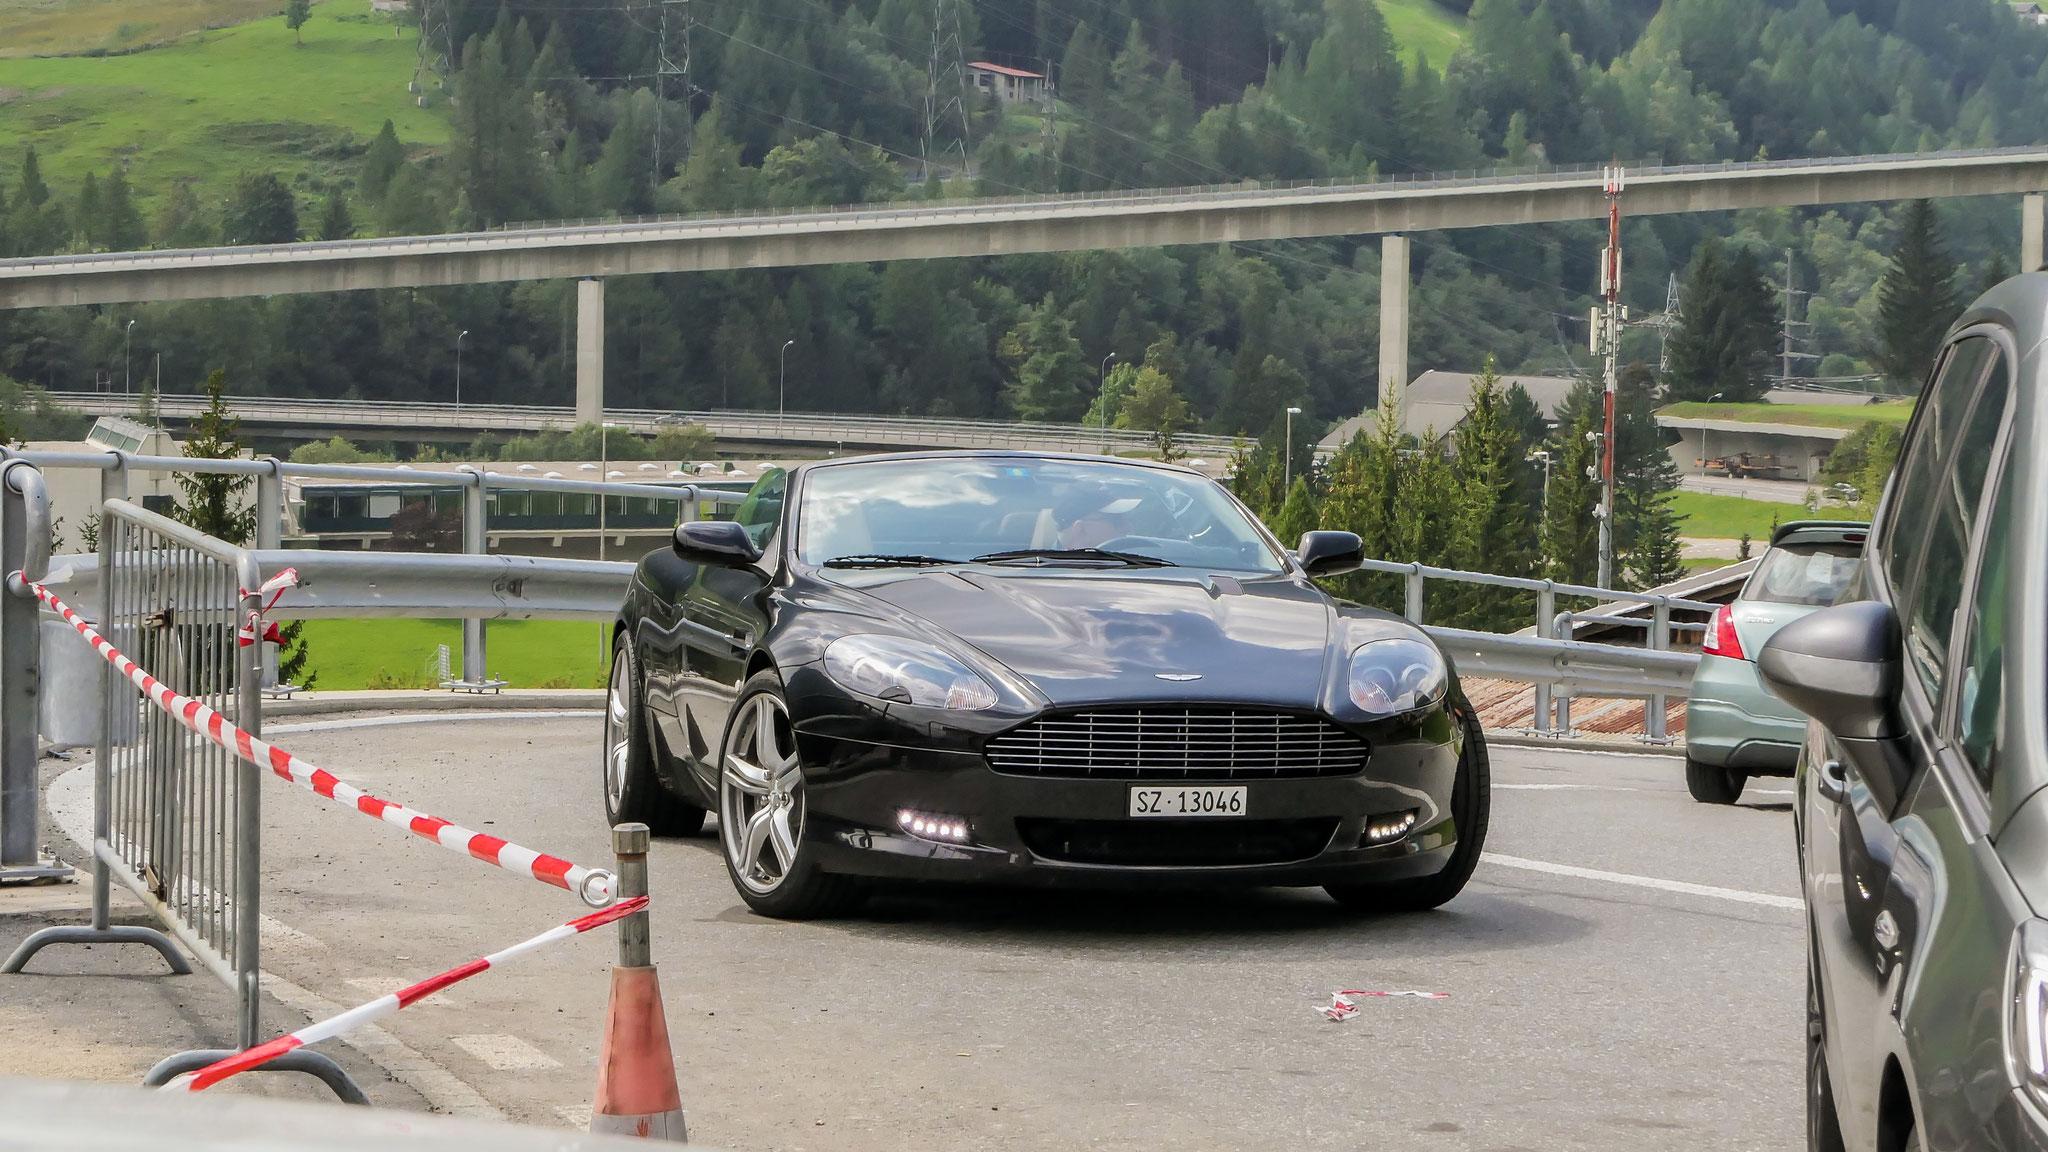 Aston Martin DB9 Volante - SZ-13046 (CH)